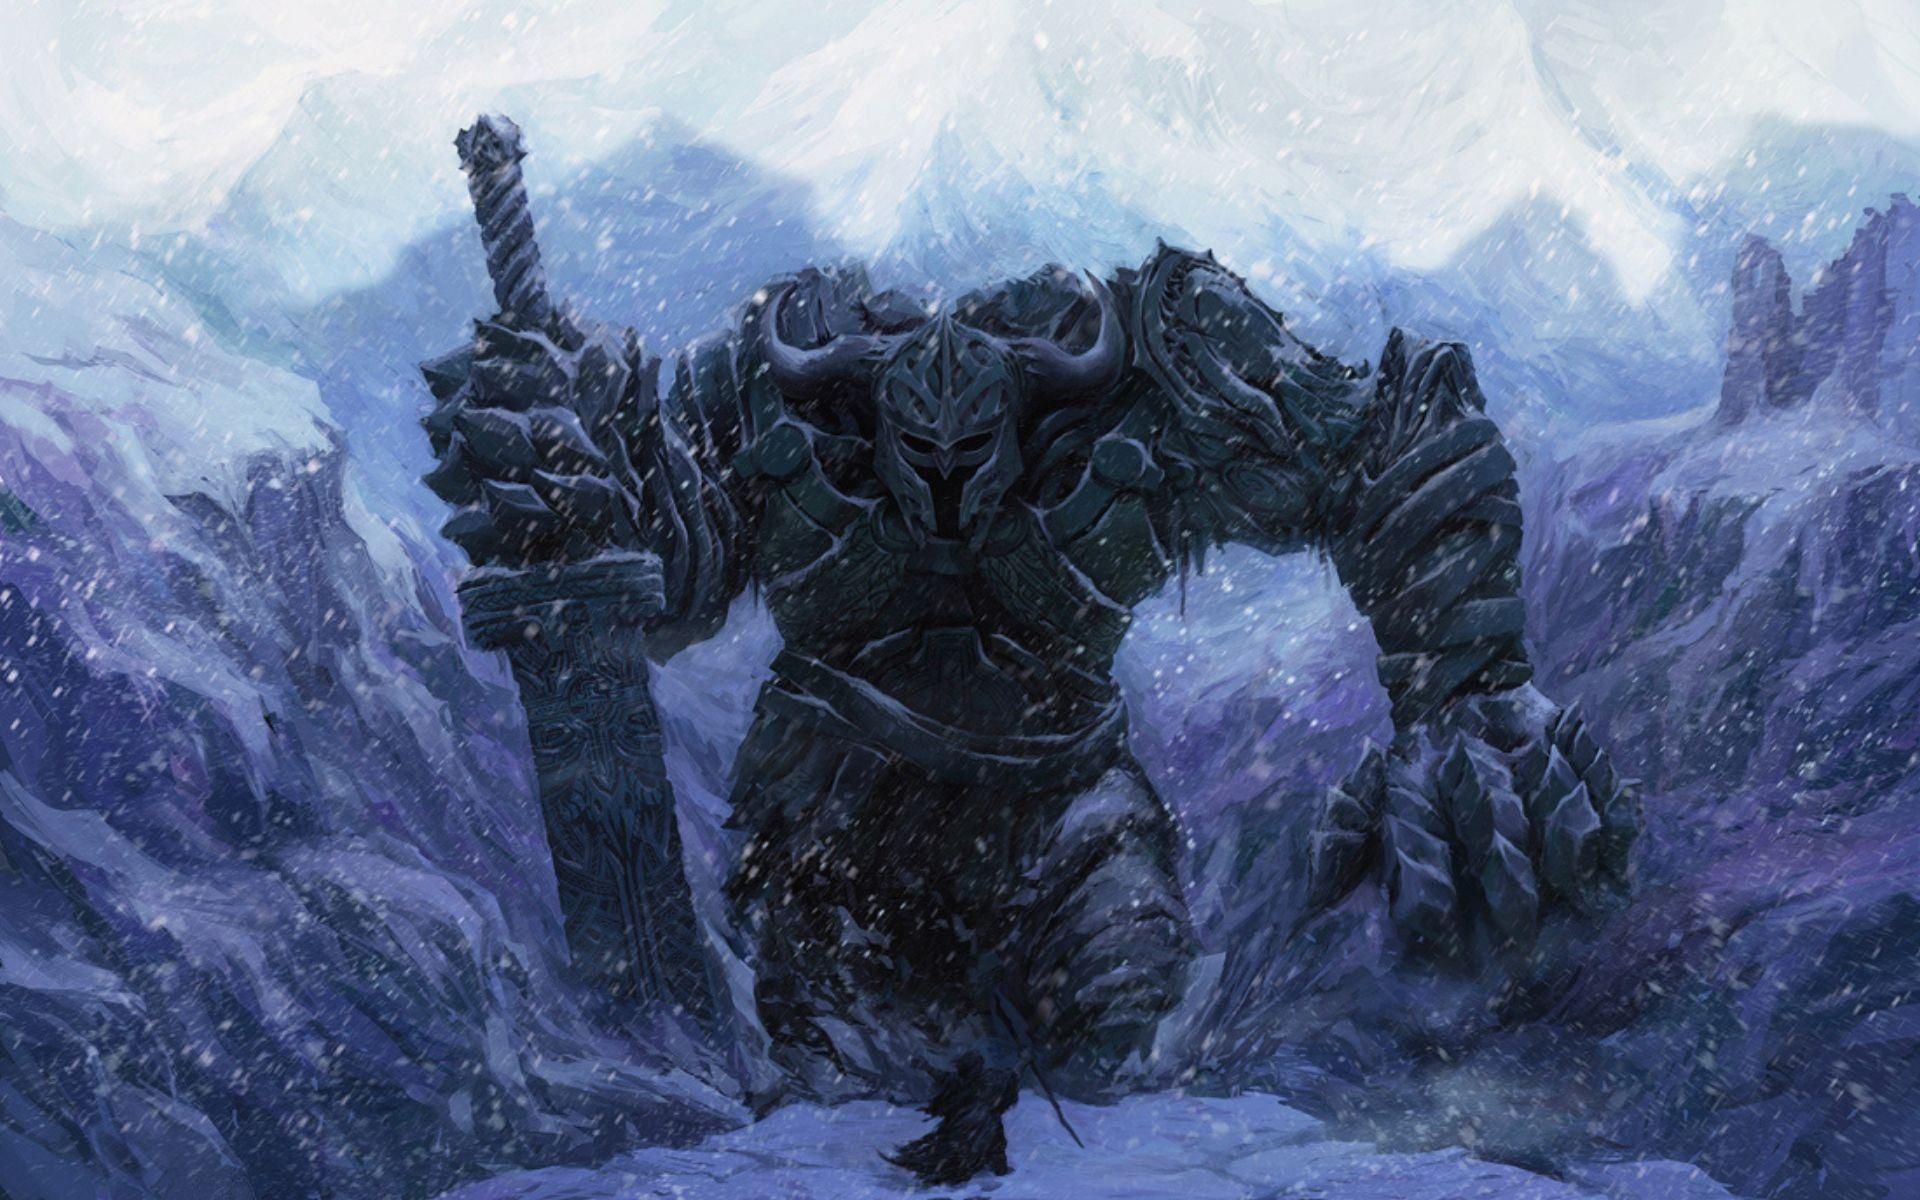 Summon Warriors Wallpaper Fantasy Warrior Giant Skeleton Fantasy giants wallpapers fantasy